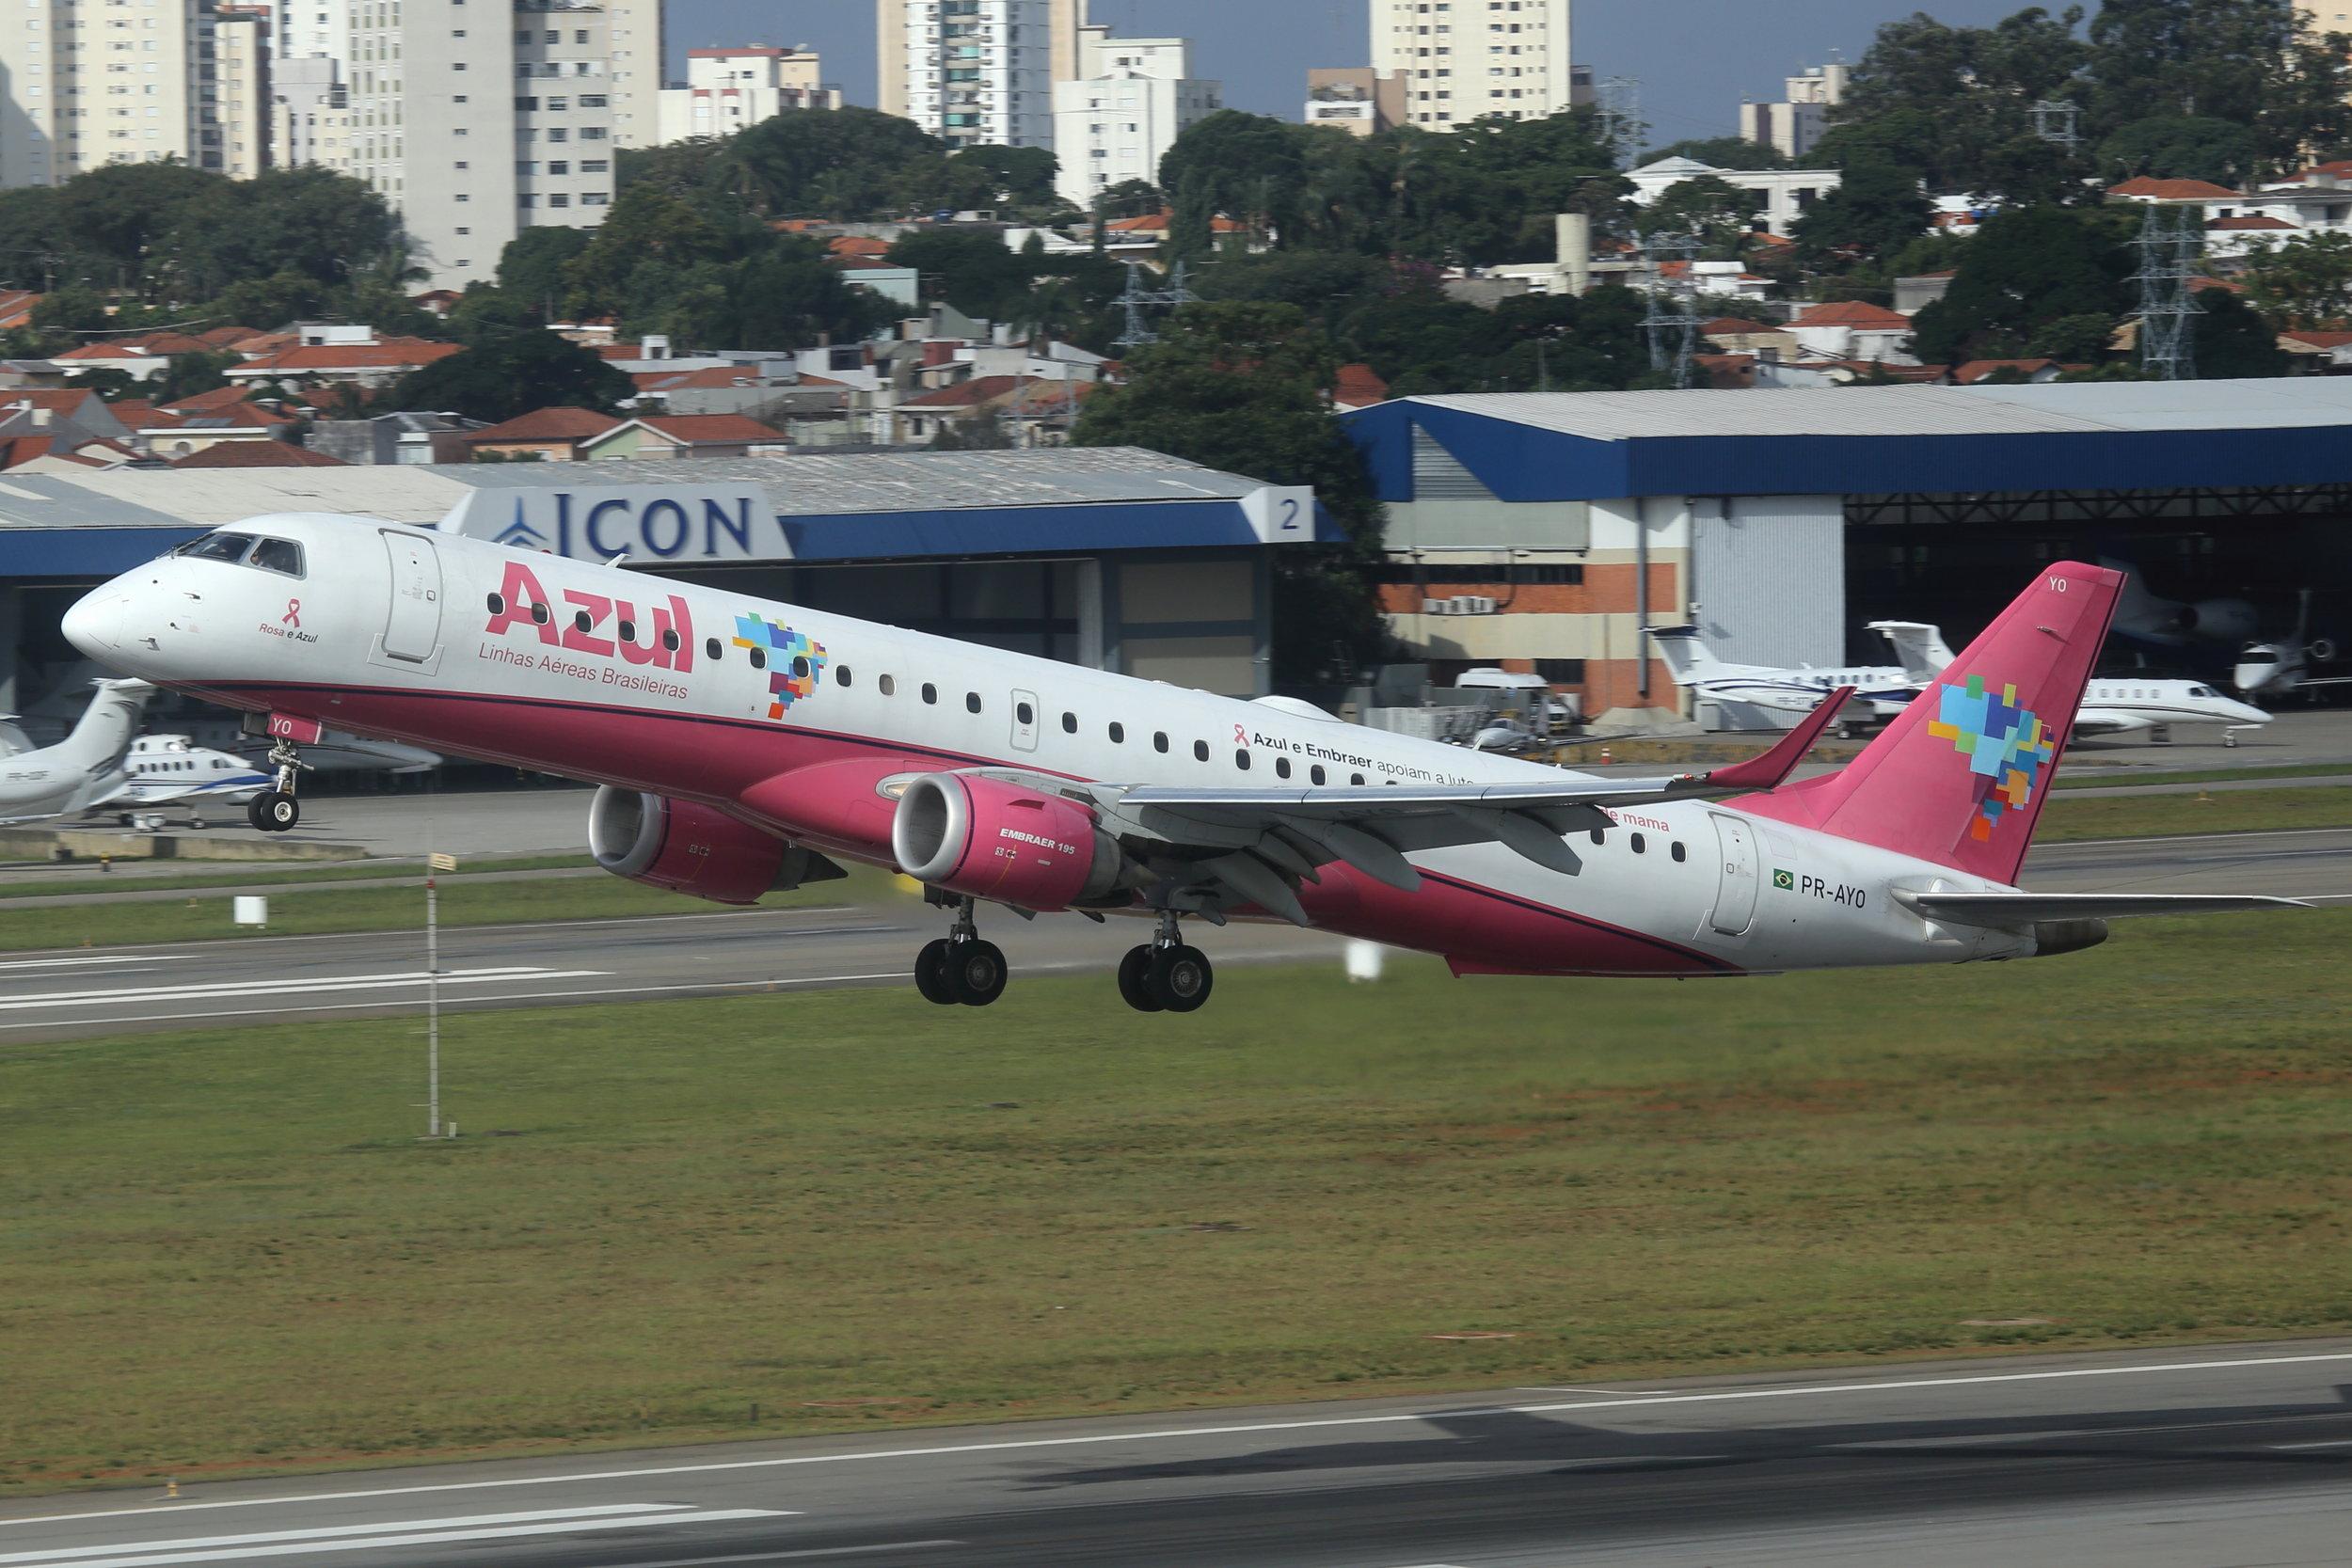 PR-AYO AZUL Linhas Aereas Brasileiras Embraer 195AR departing Sao Paulo Congonhas Airport taken from the Slaveiro Slim hotel 28th April 2019 by John Wood